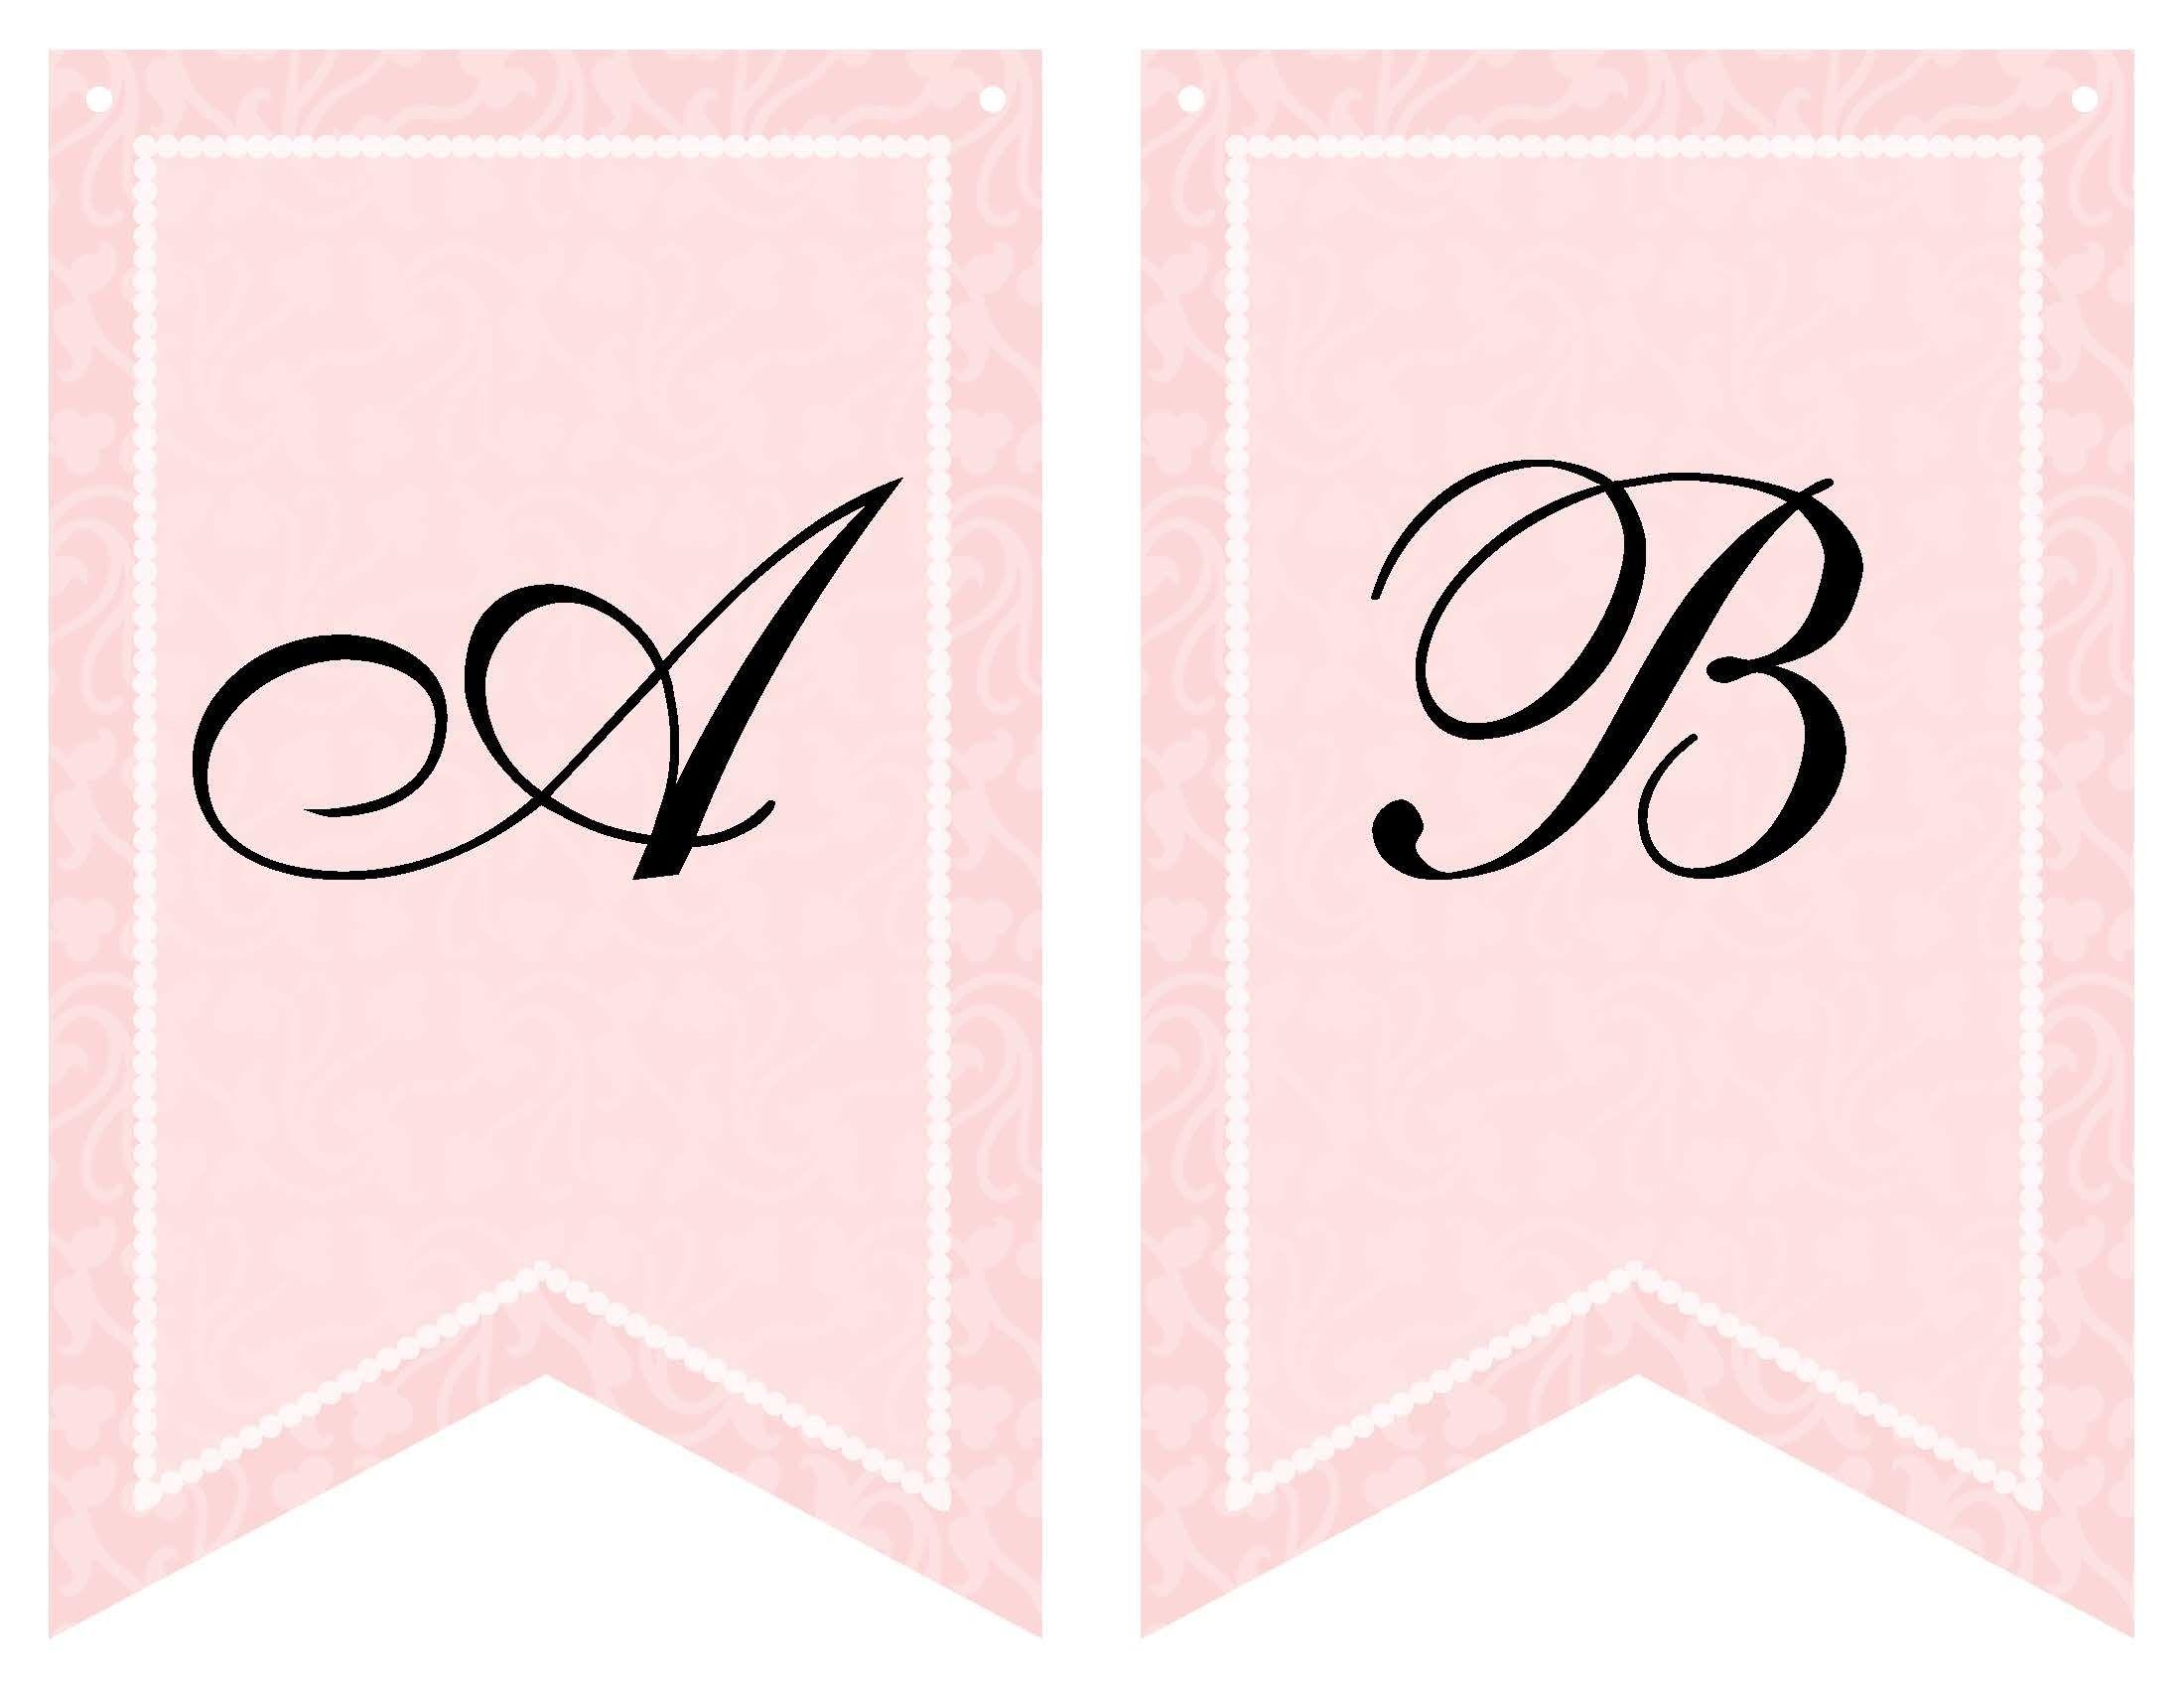 Free Printable Bridal Shower Banner   Vow Renewal   Pinterest - Free Bridal Shower Printable Decorations